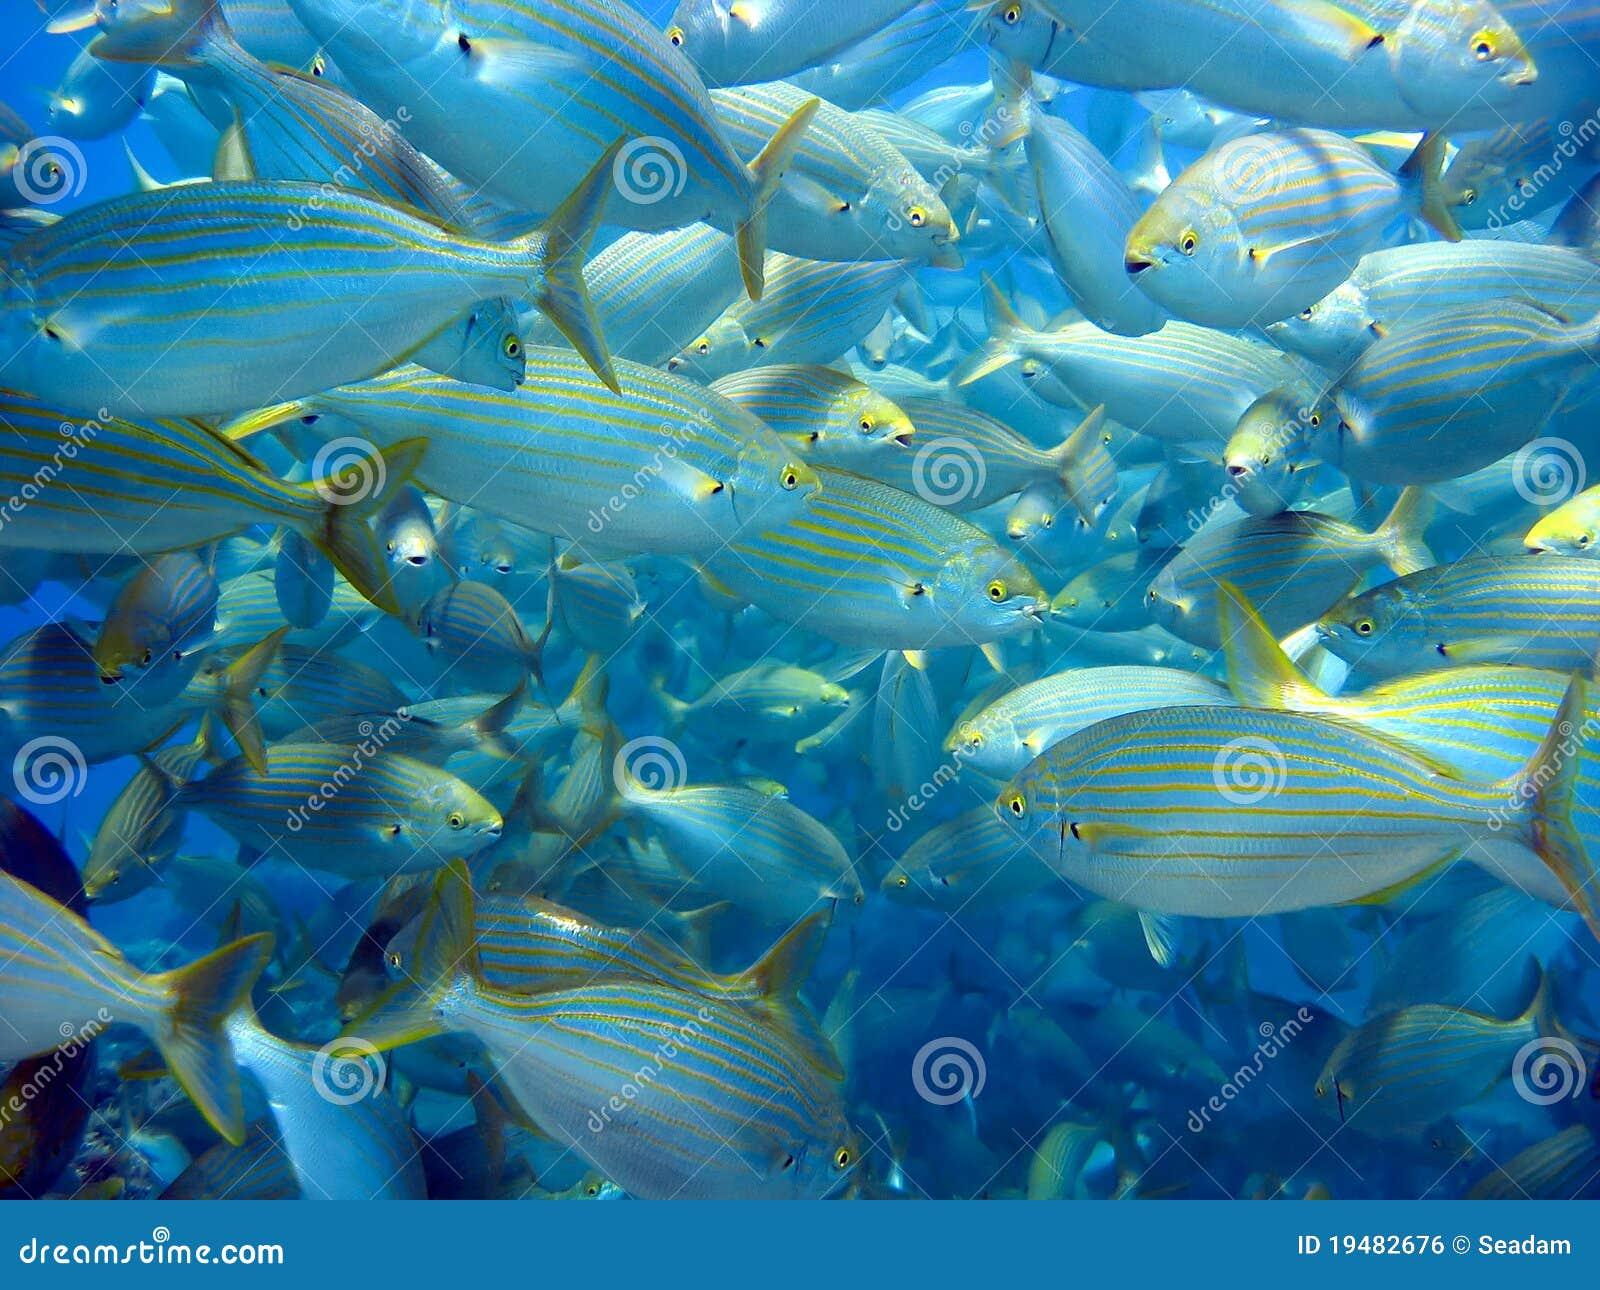 Big school of fish royalty free stock image image 19482676 for School of fish